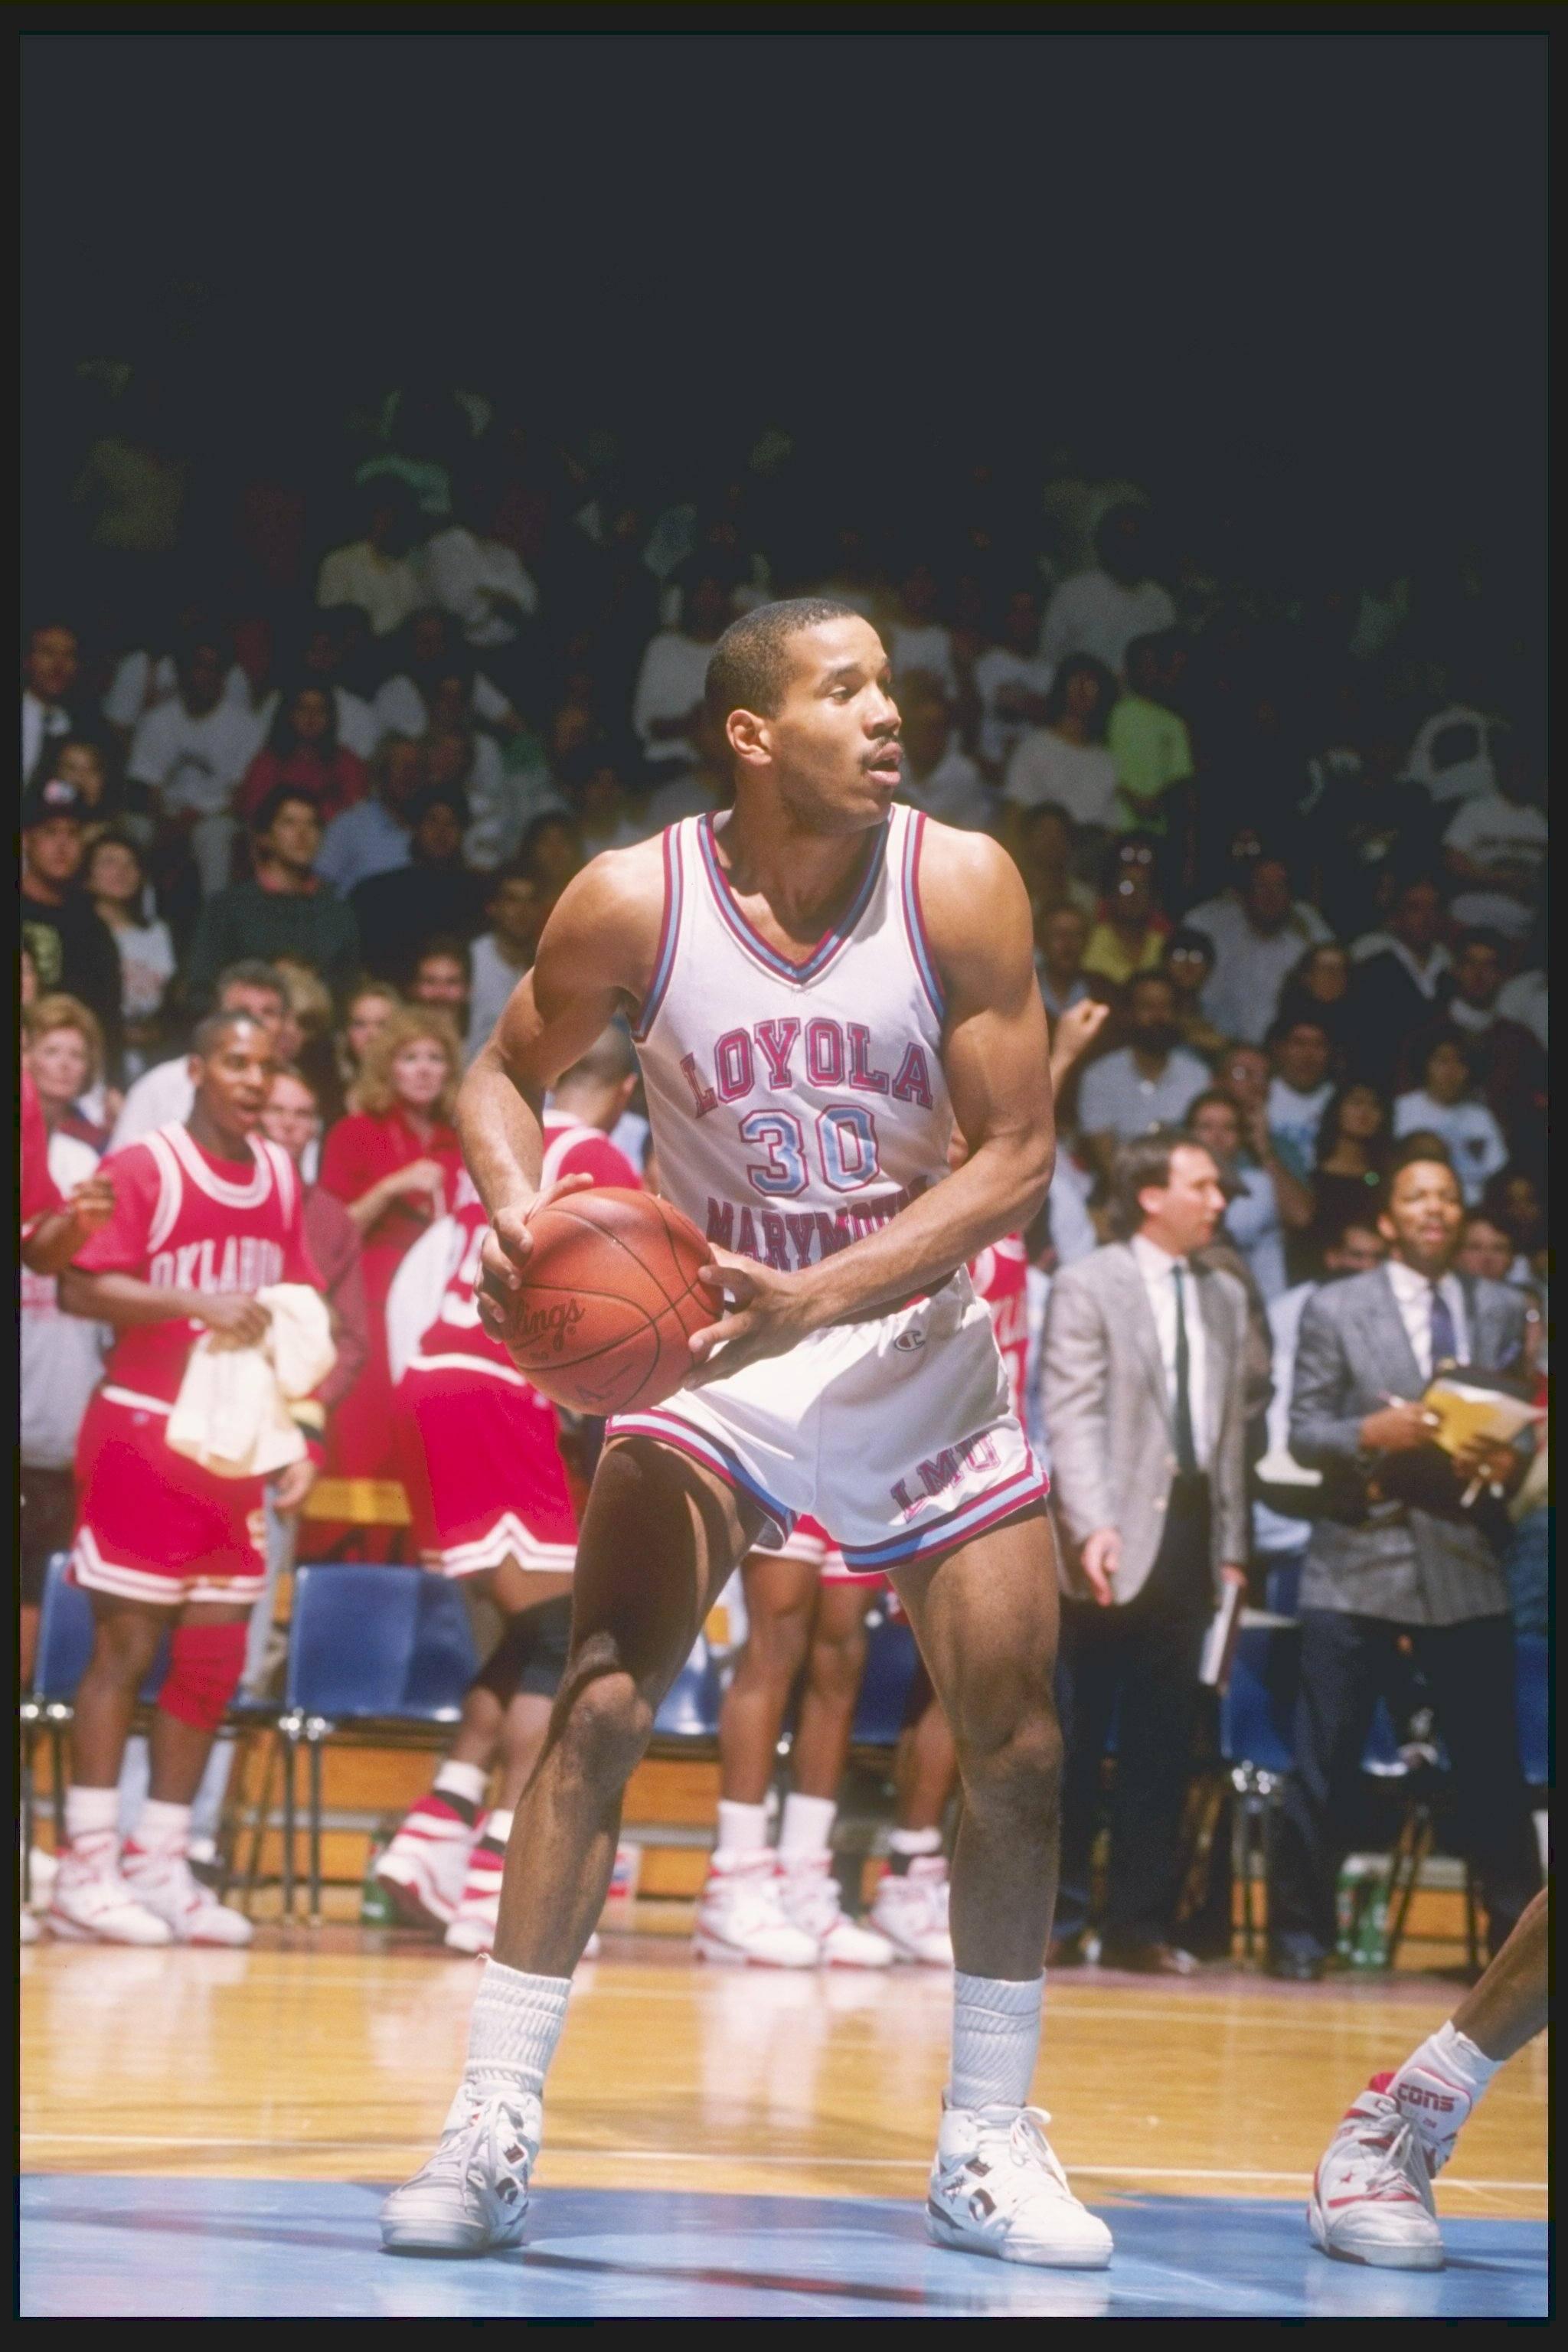 Bo Kimble of Loyola holds the ball